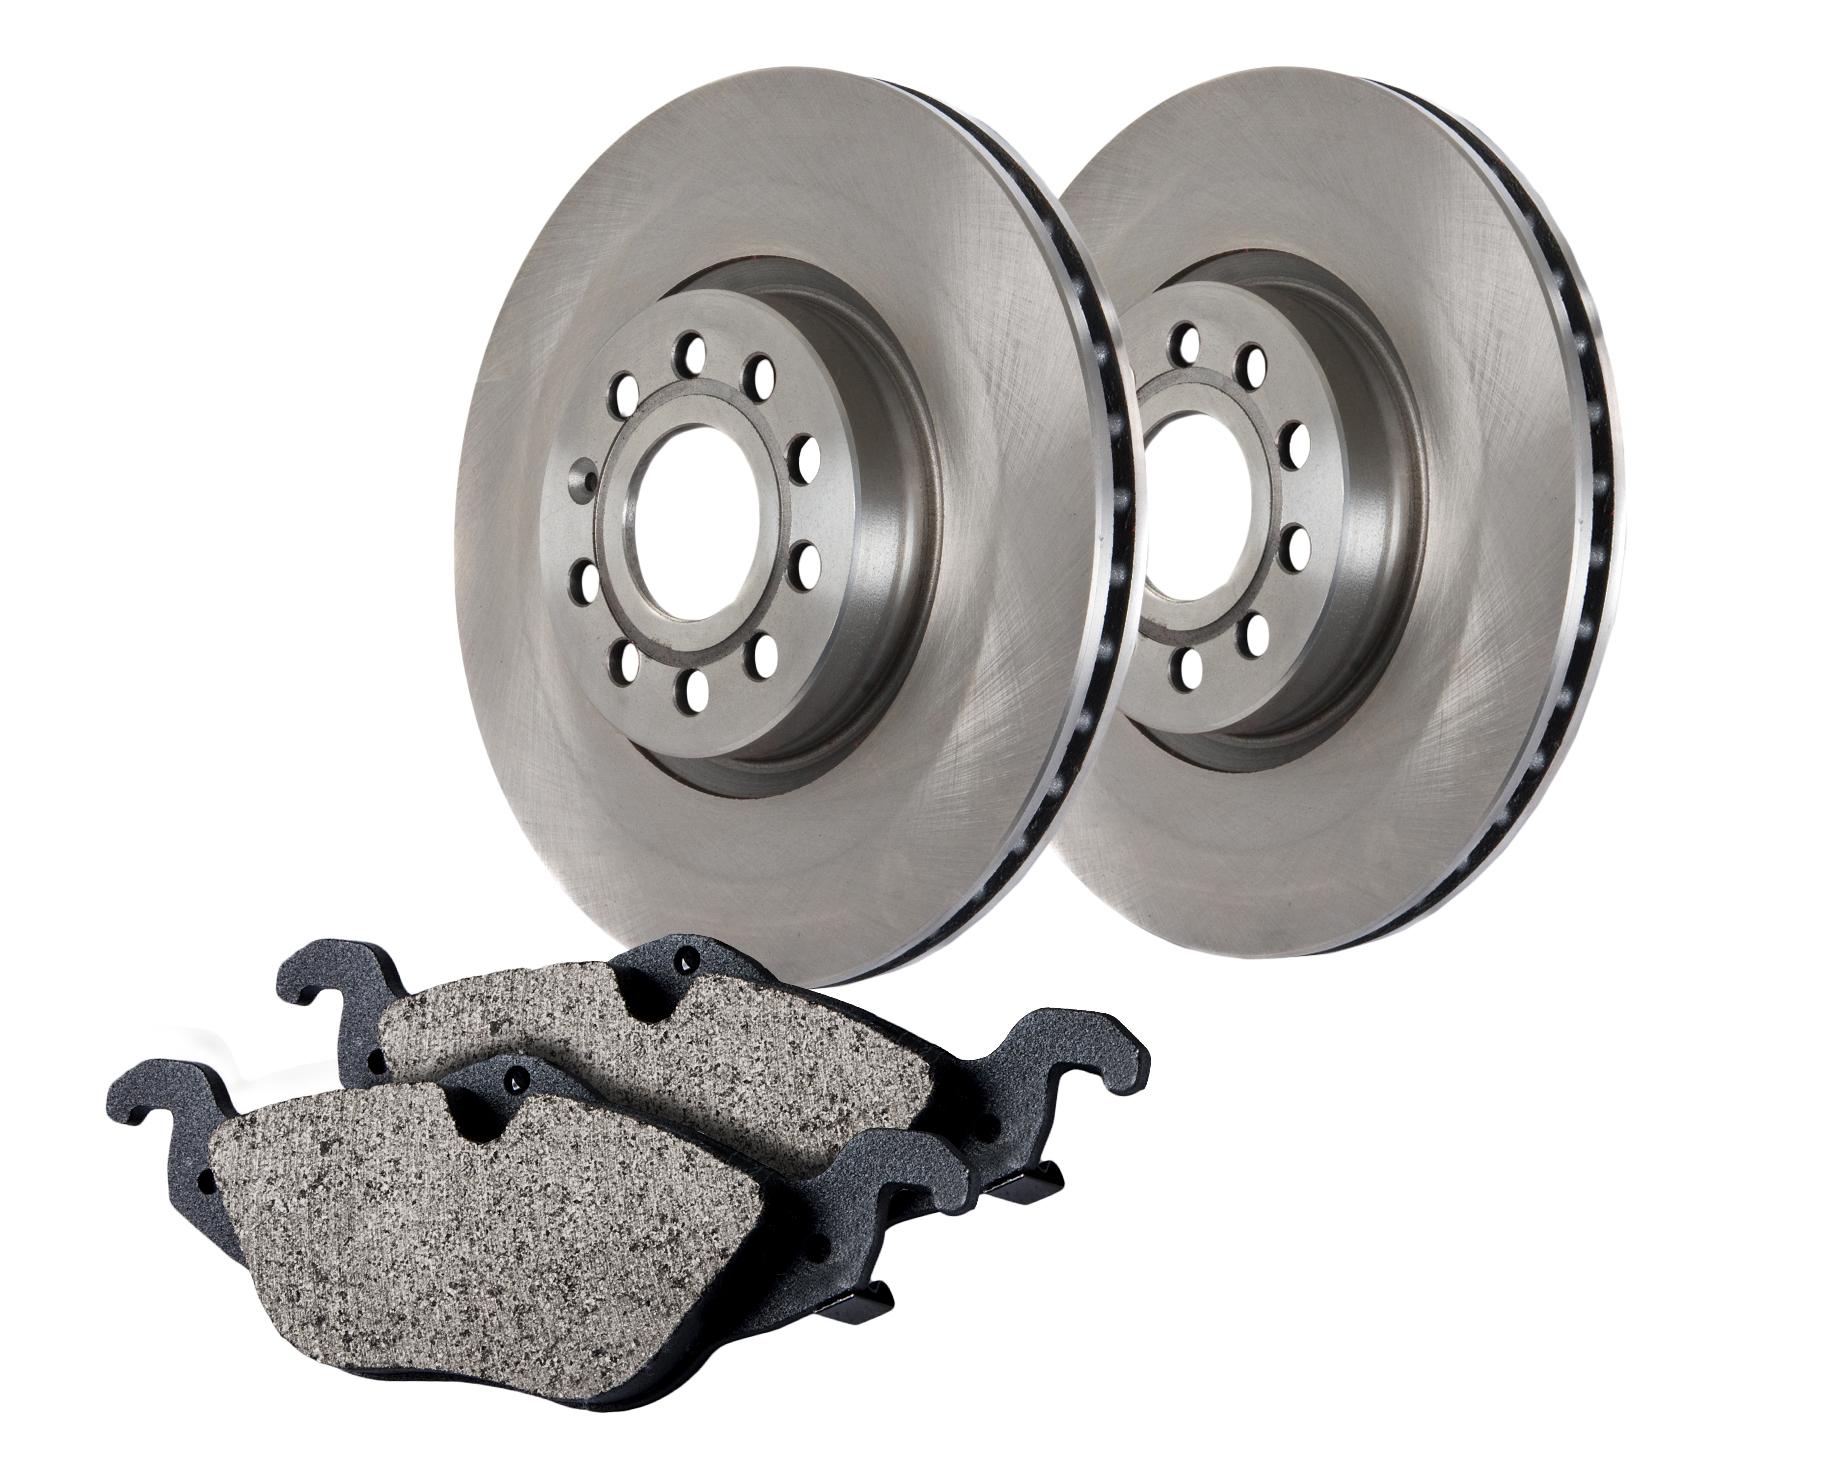 Centric Brake Parts 905.61017 Brake Rotor and Pad Kit, Premium, Semi-Metallic Pads, Iron, Natural, Ford Midsize Car 2006-12, Kit